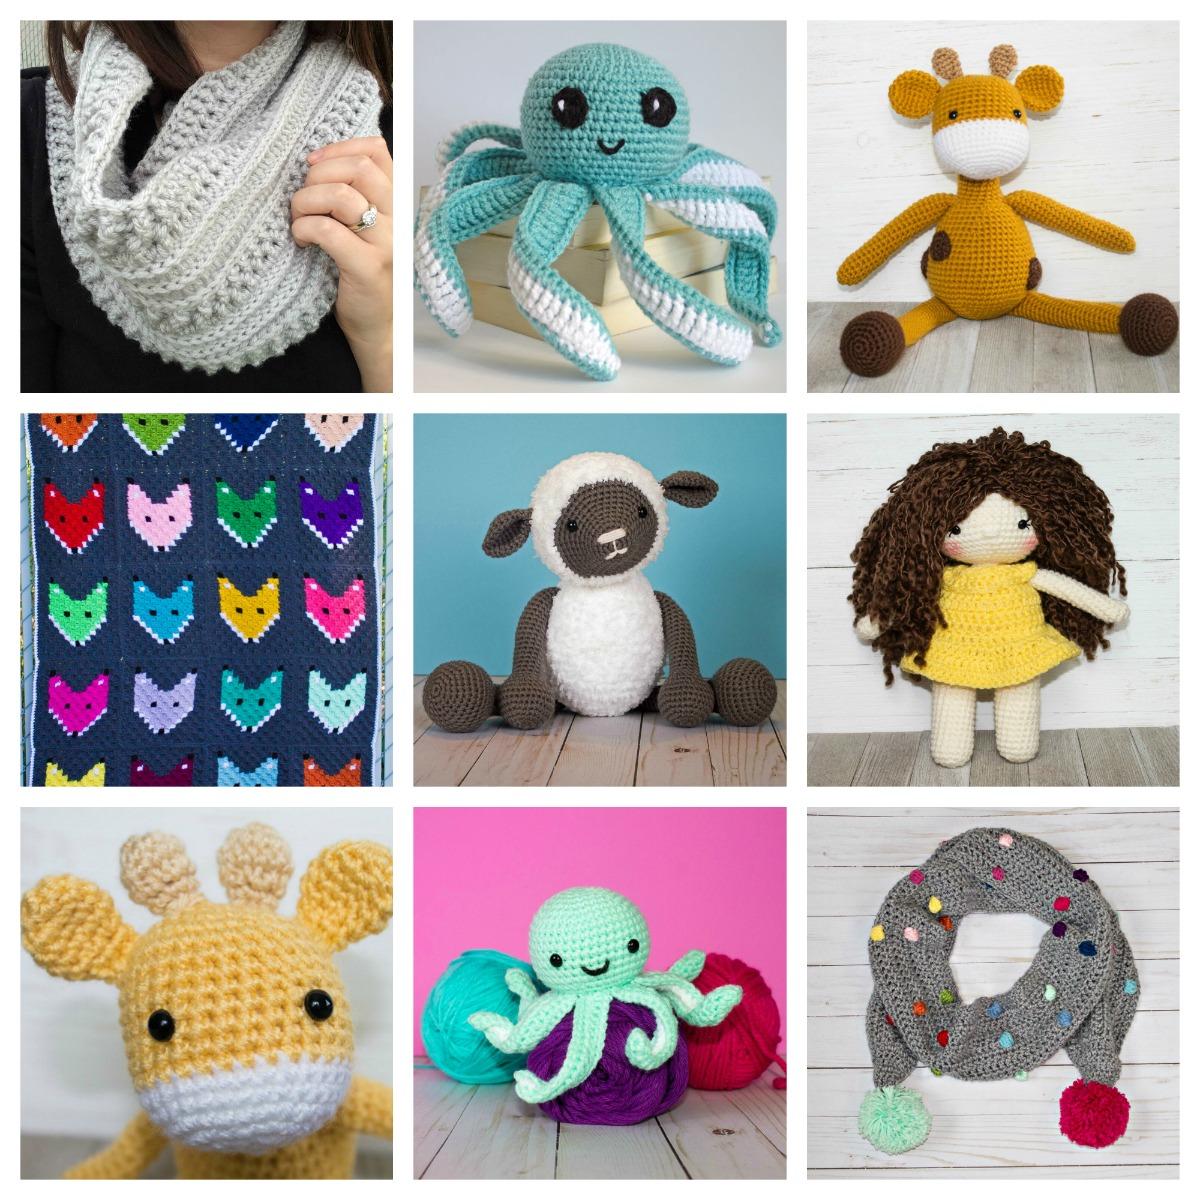 Free Crochet Dinosaur Pattern The Friendly Dino Thefriendlyredfox